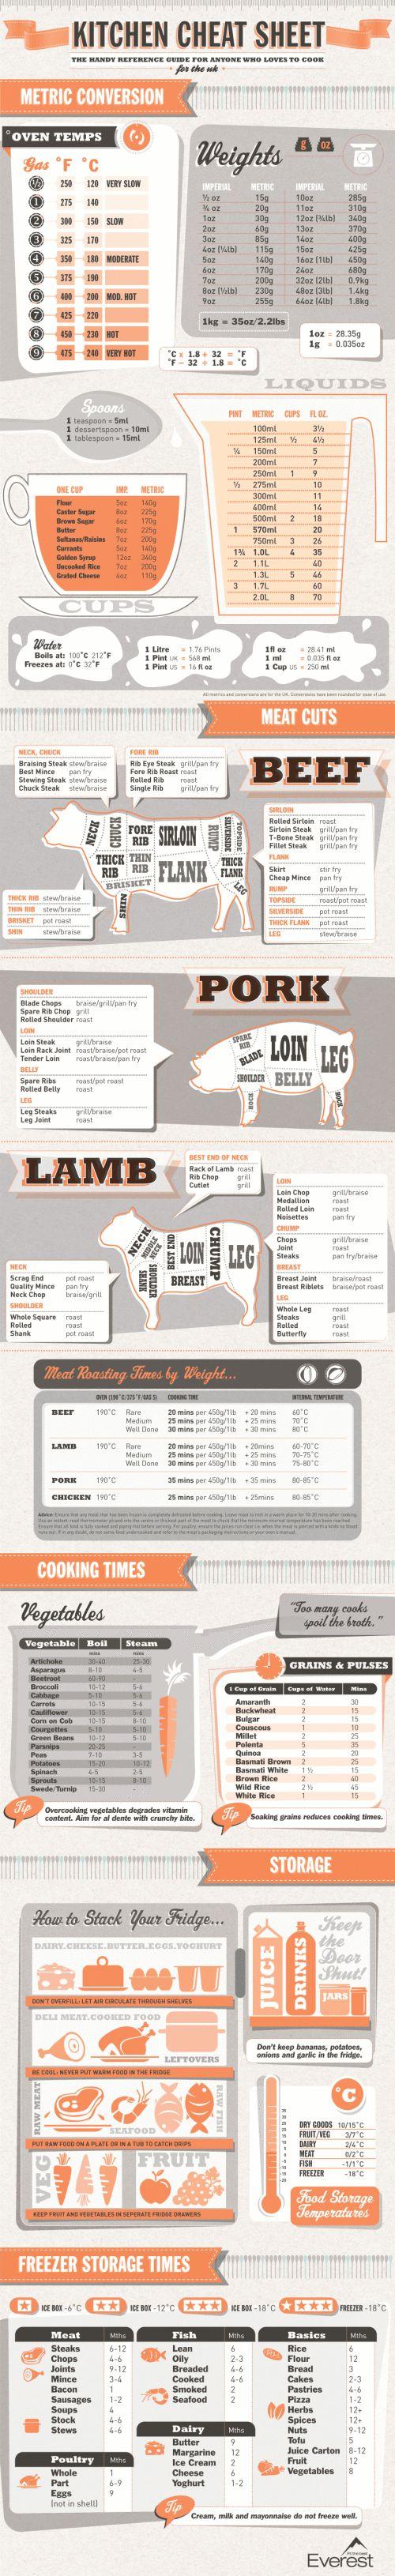 Kitchen Cheat Sheet Infographic: